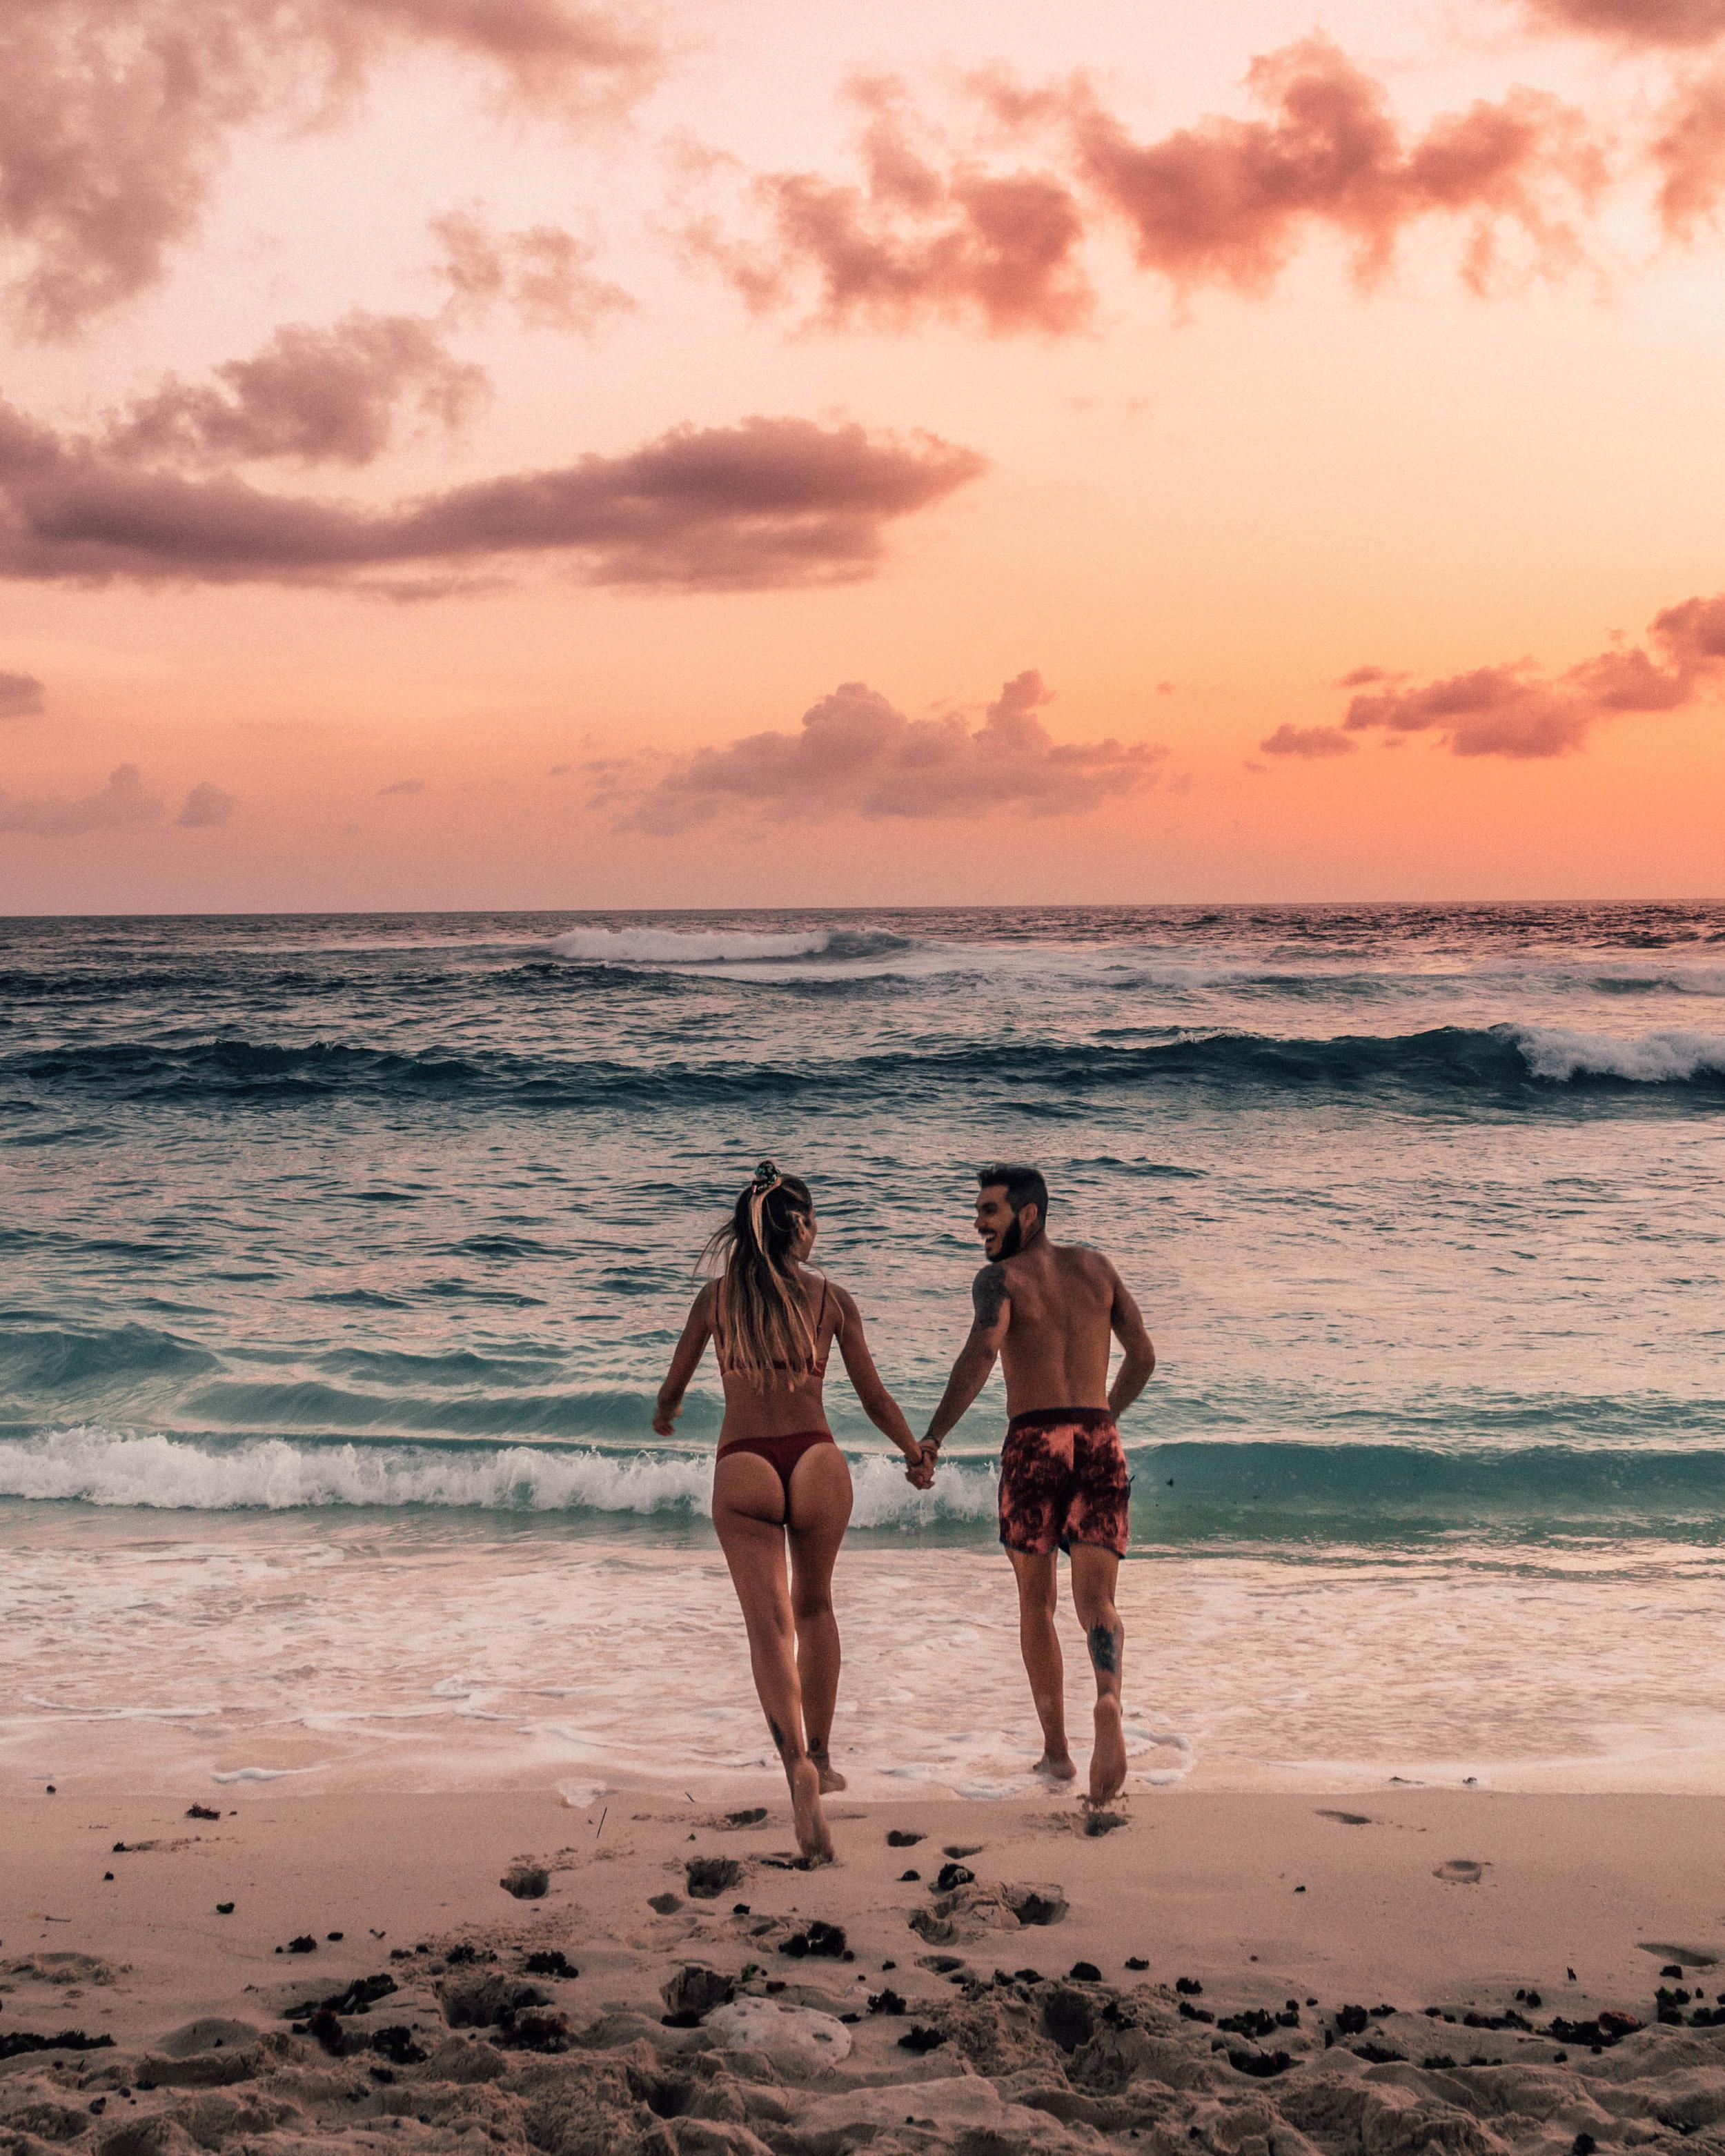 nusa lembongam ceningan indonesia bali island paradise beautiful beaches asia travel photography sunset love happiness guide